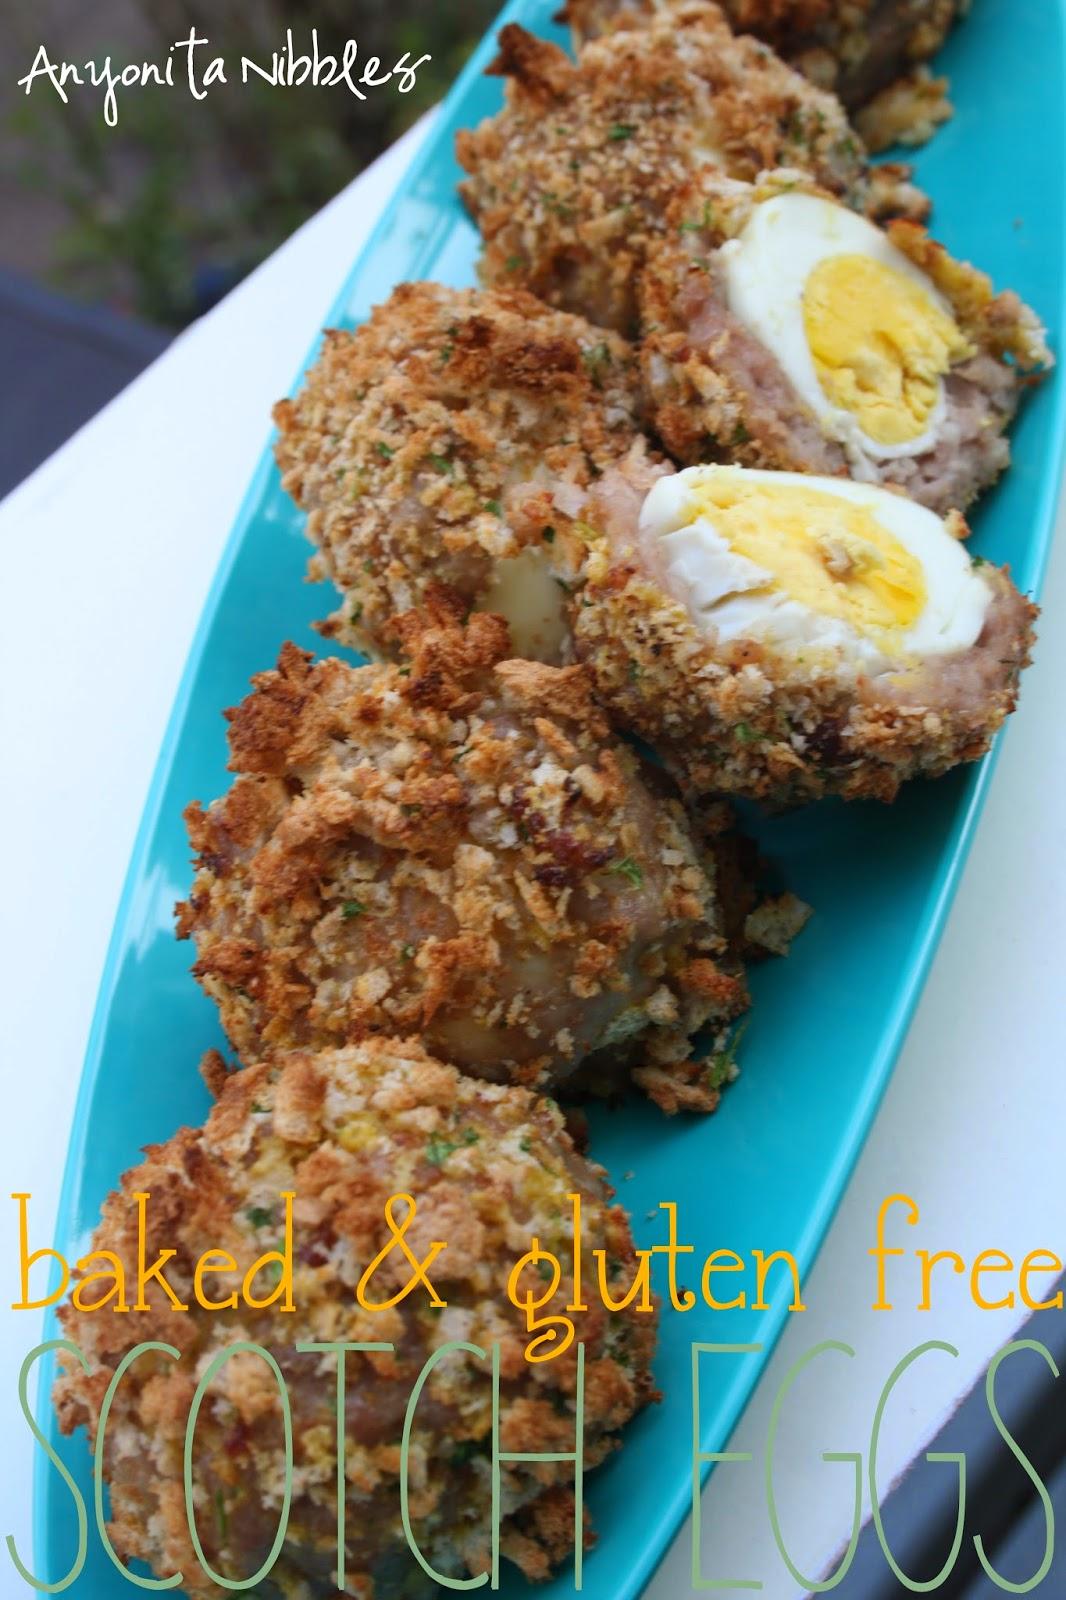 Anyonita Nibbles Gluten Free Recipes Baked Amp Gluten